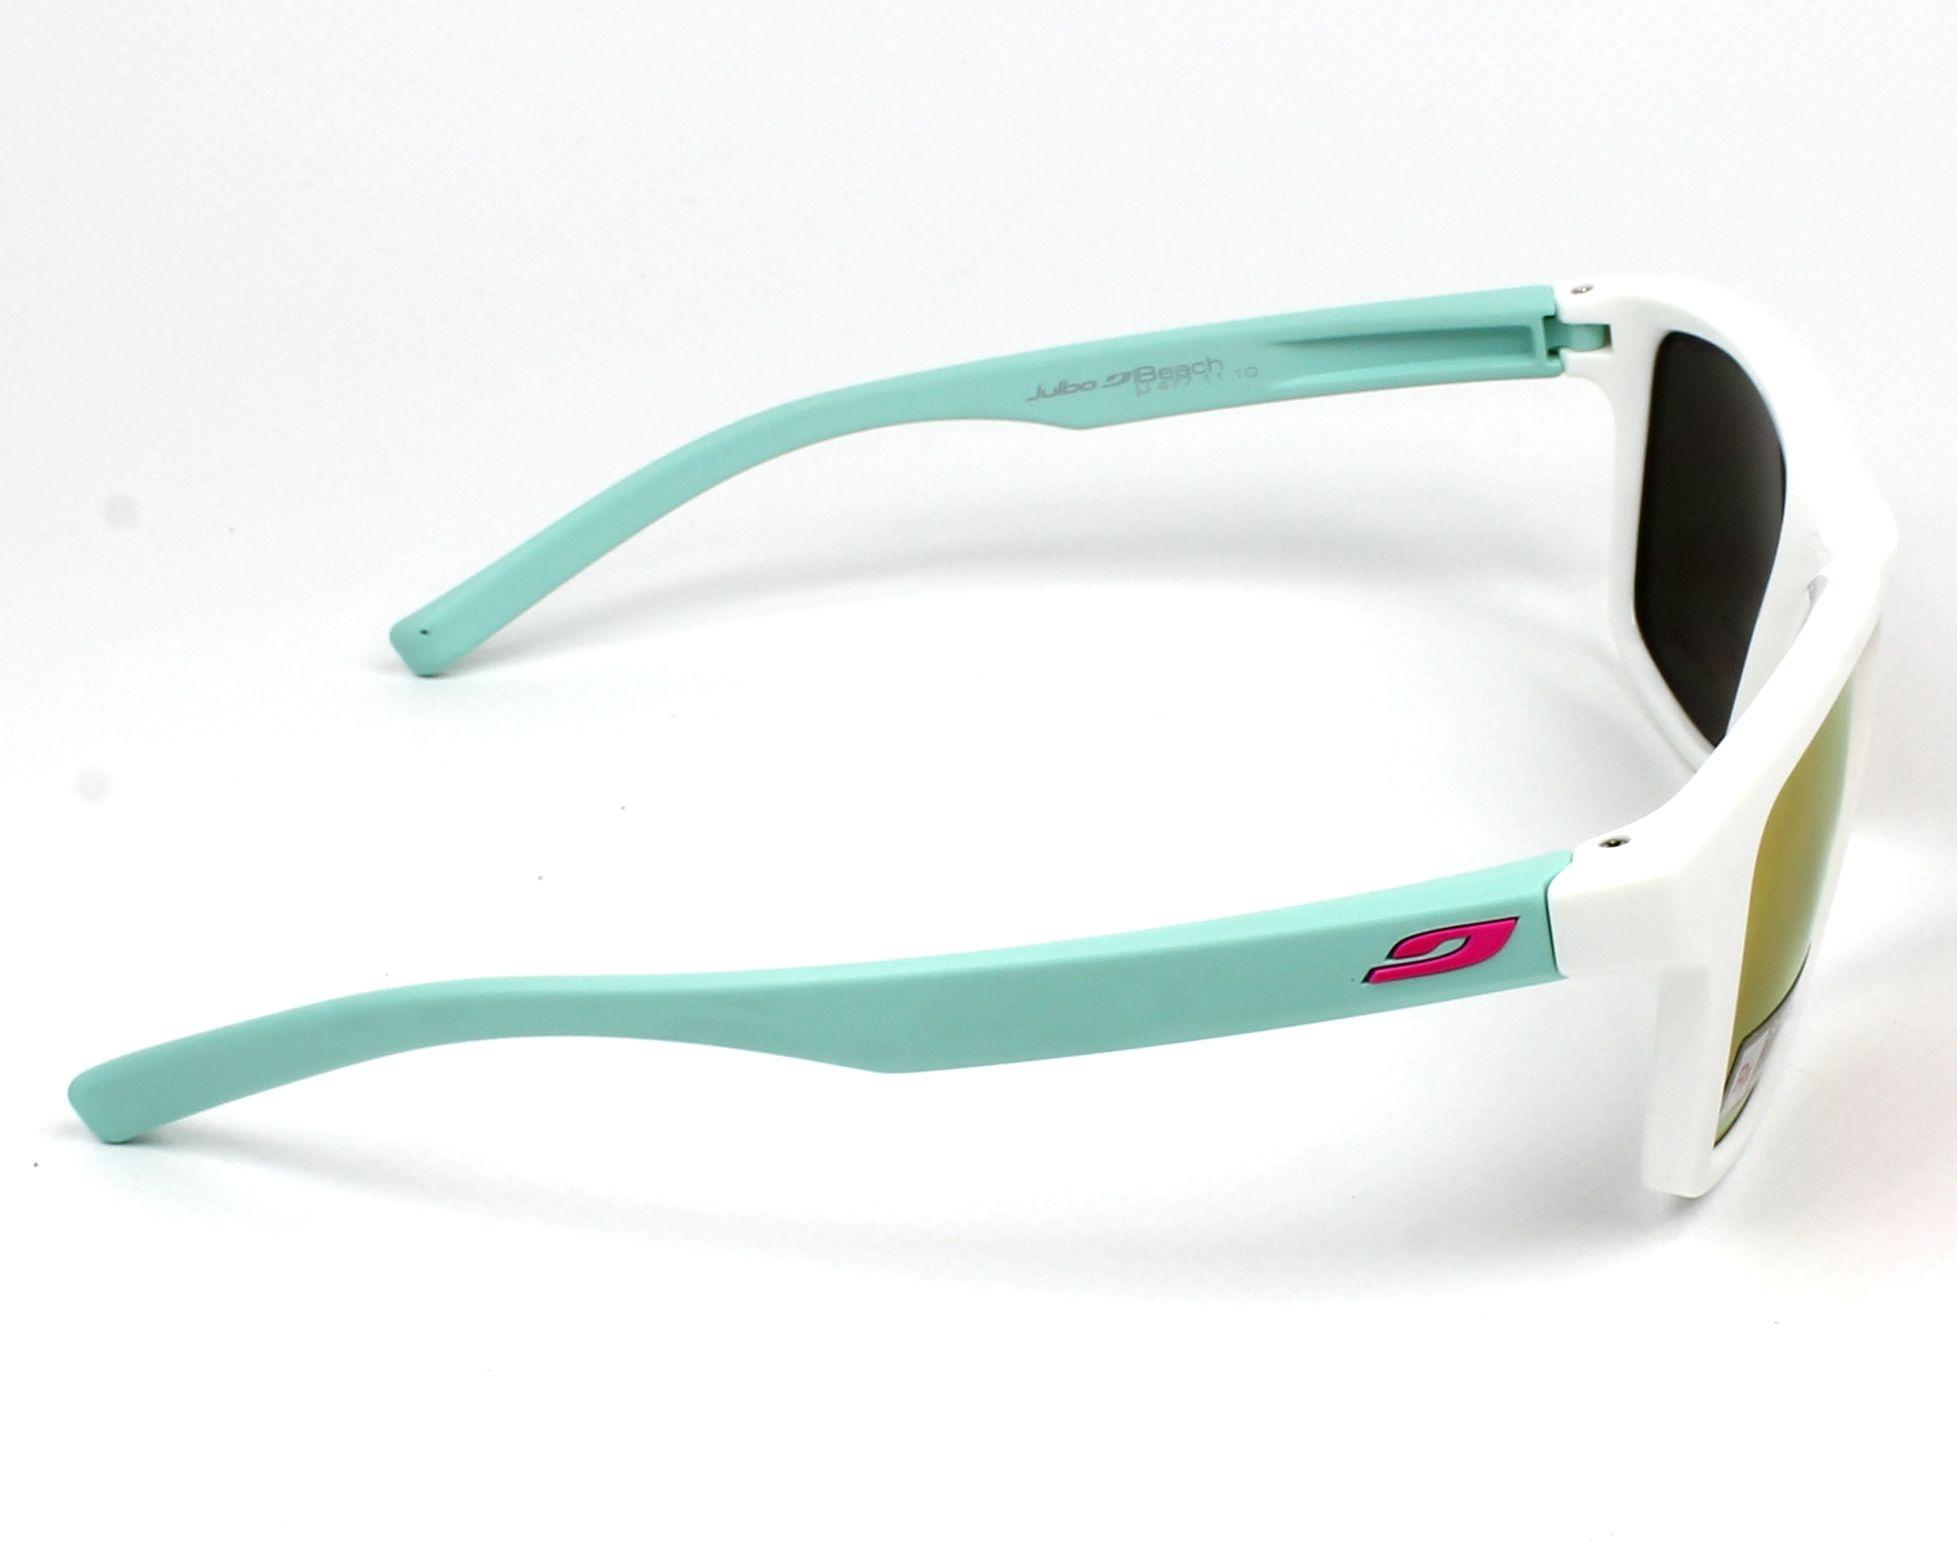 bb9b0573a6 Sunglasses Julbo J477 1110 - White Green side view